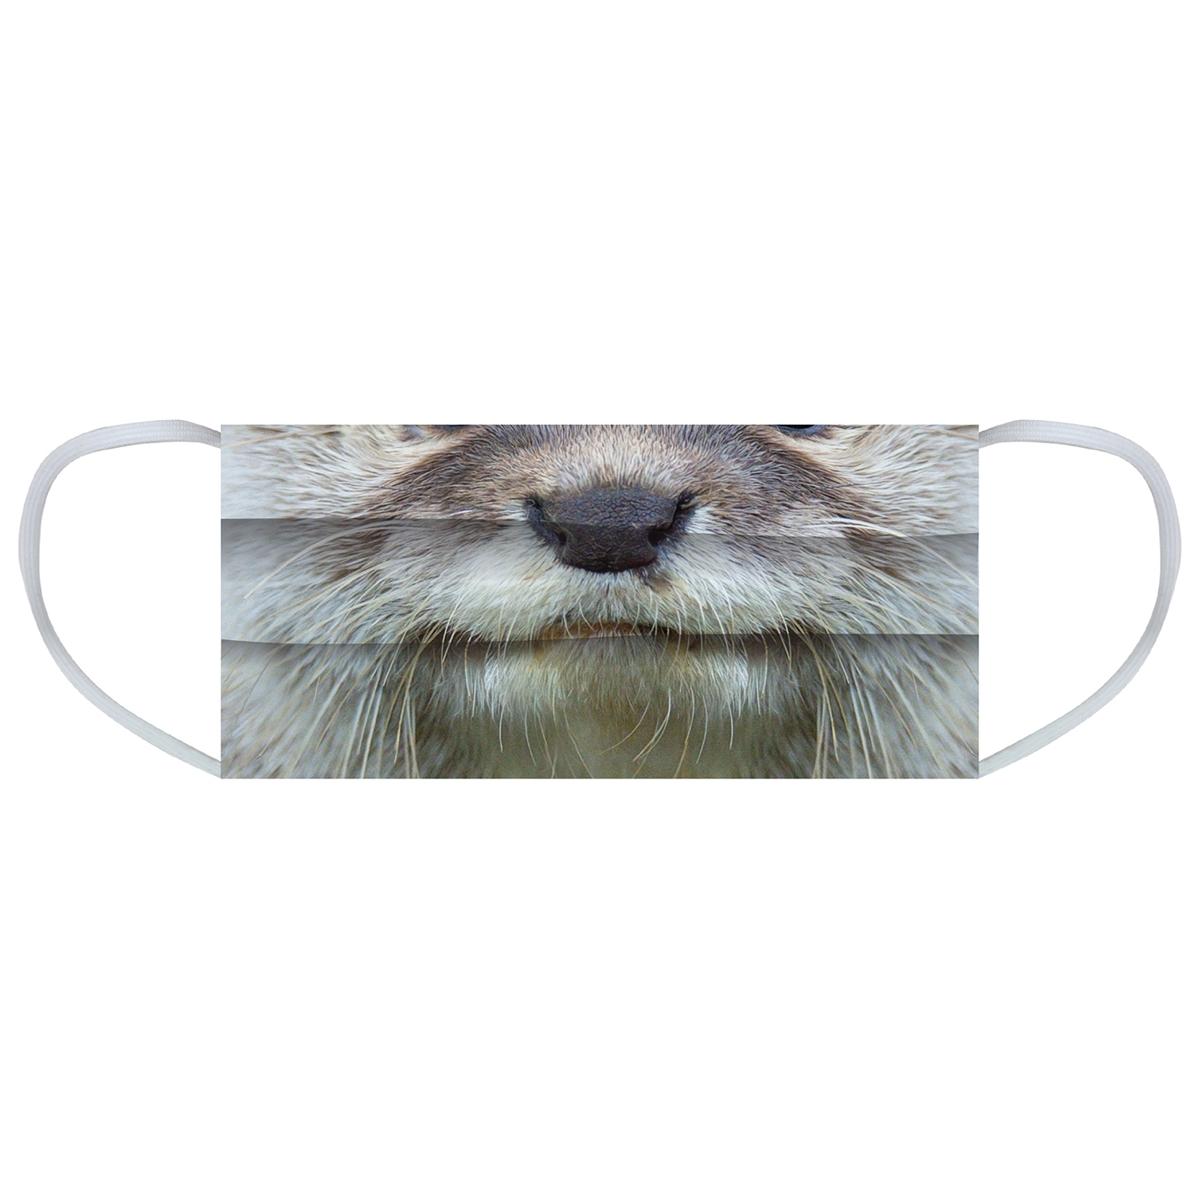 River Otter Face Mask